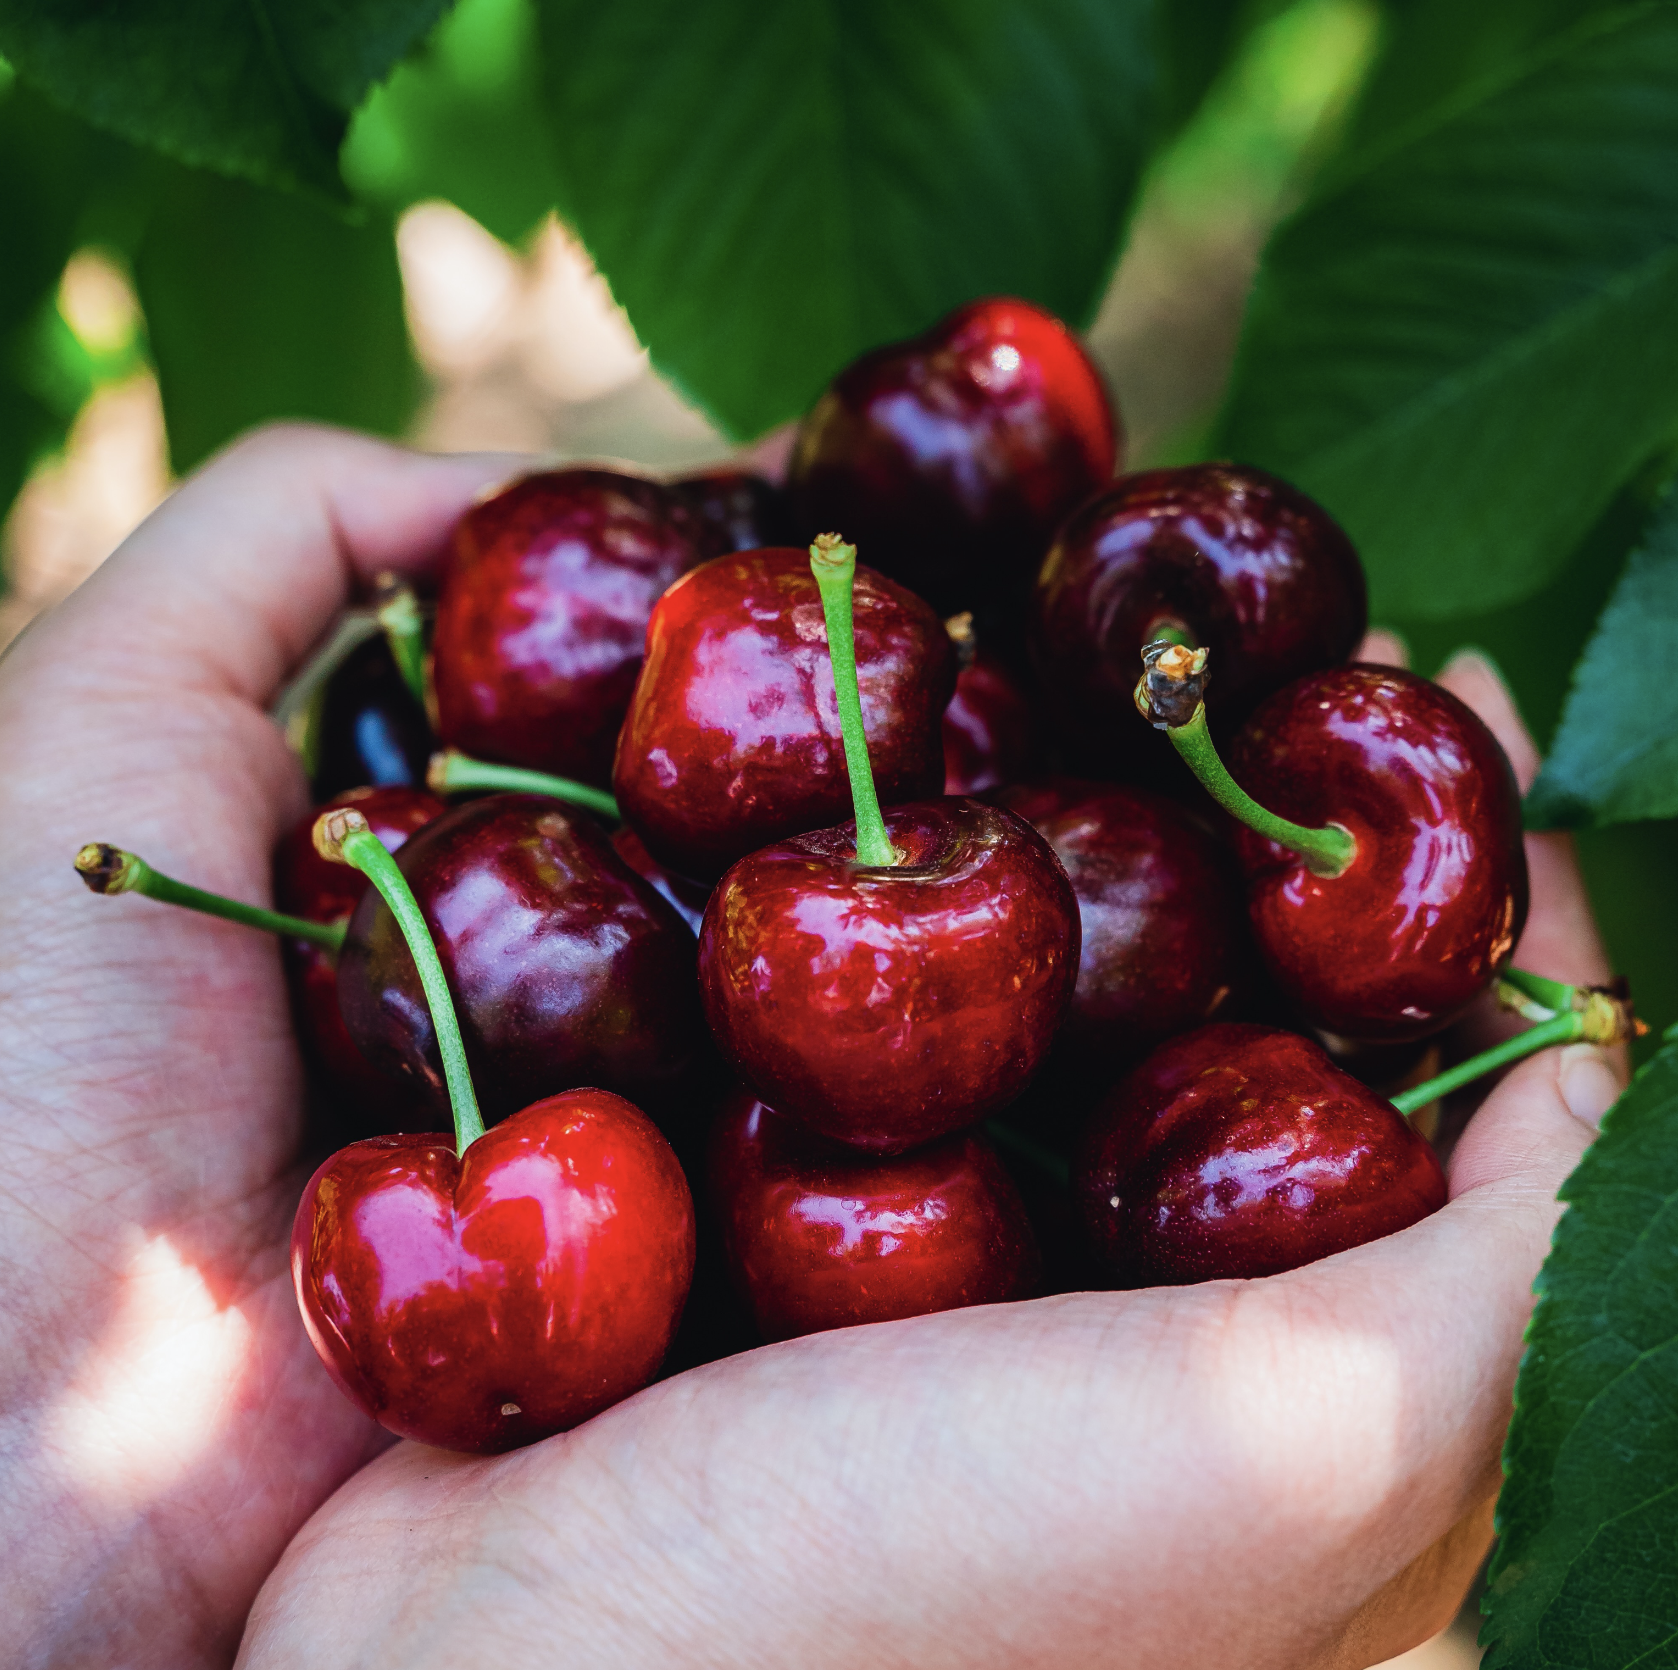 Harvest Time Brentwood - Cherry U-pick